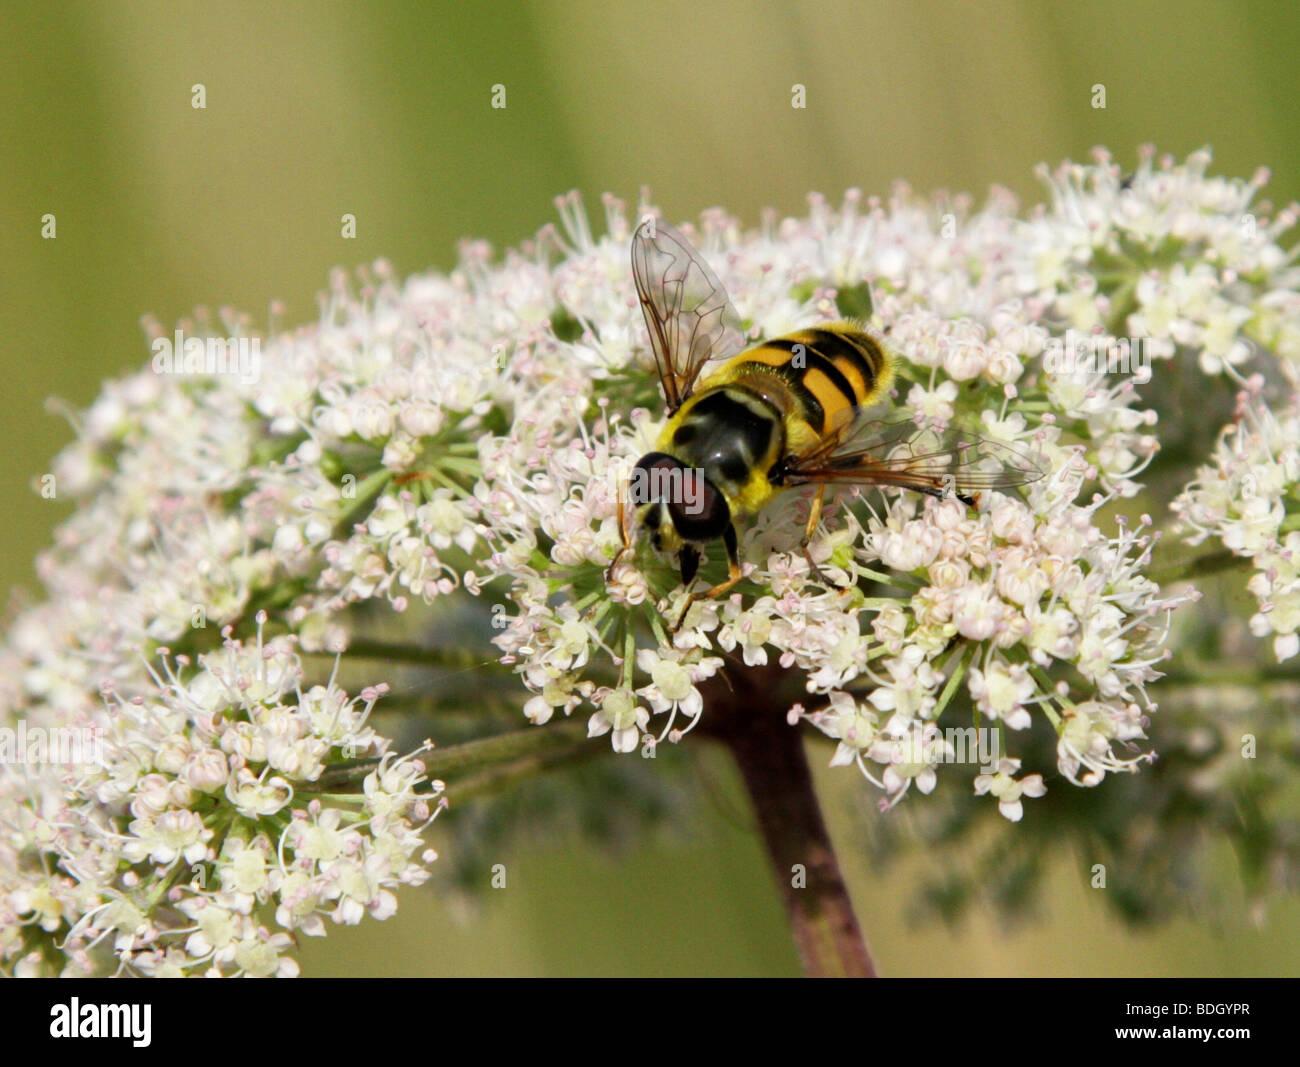 Hover fly, Myathropa florea, Syrphidae, Diptera, syn Musca florea - Stock Image